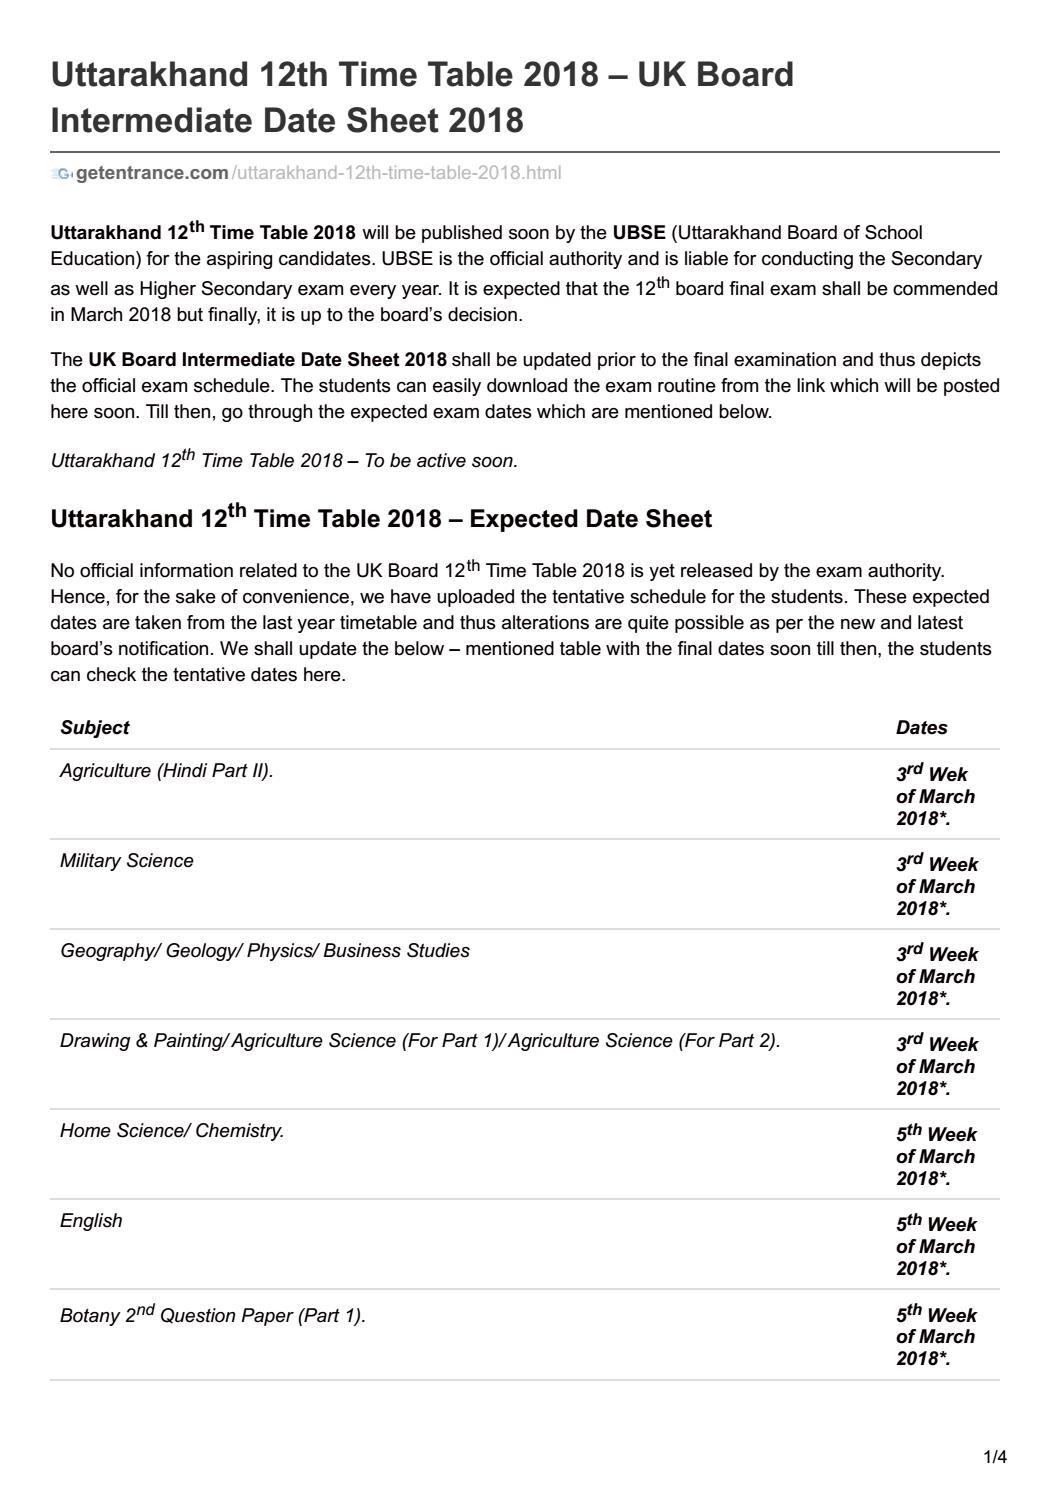 Uttarakhand 12th time table 2018 uk board intermediate date sheet